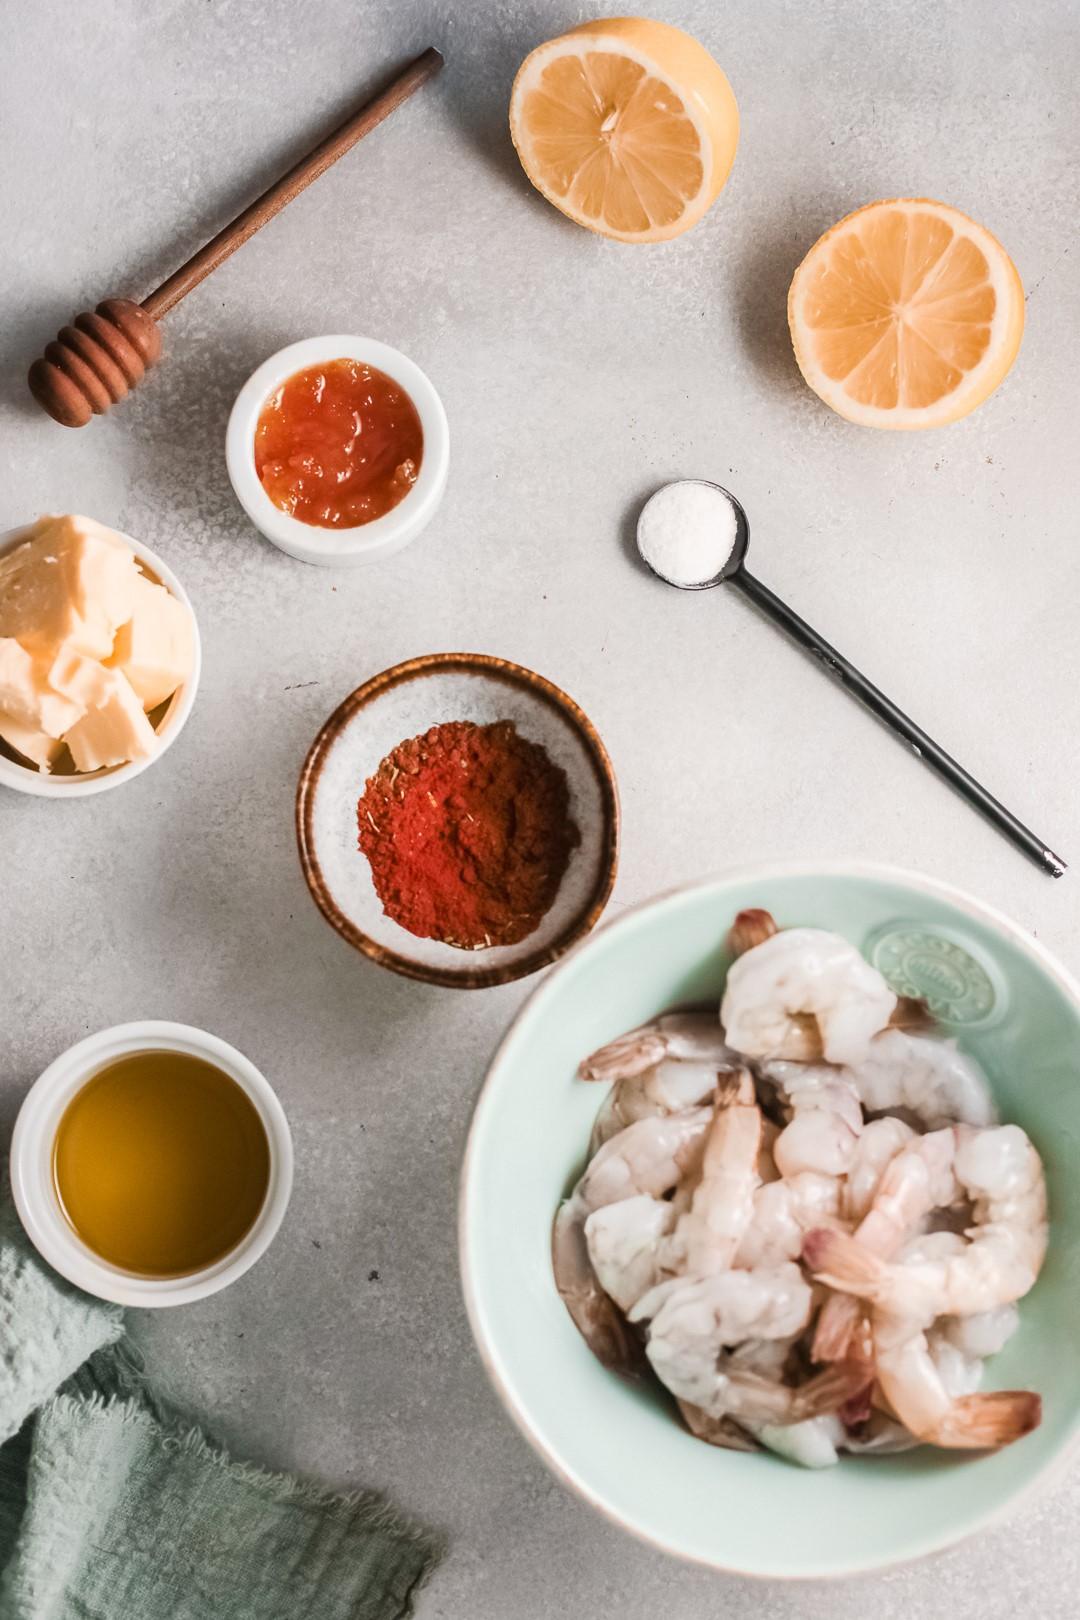 Ingredients for cajun shrimp